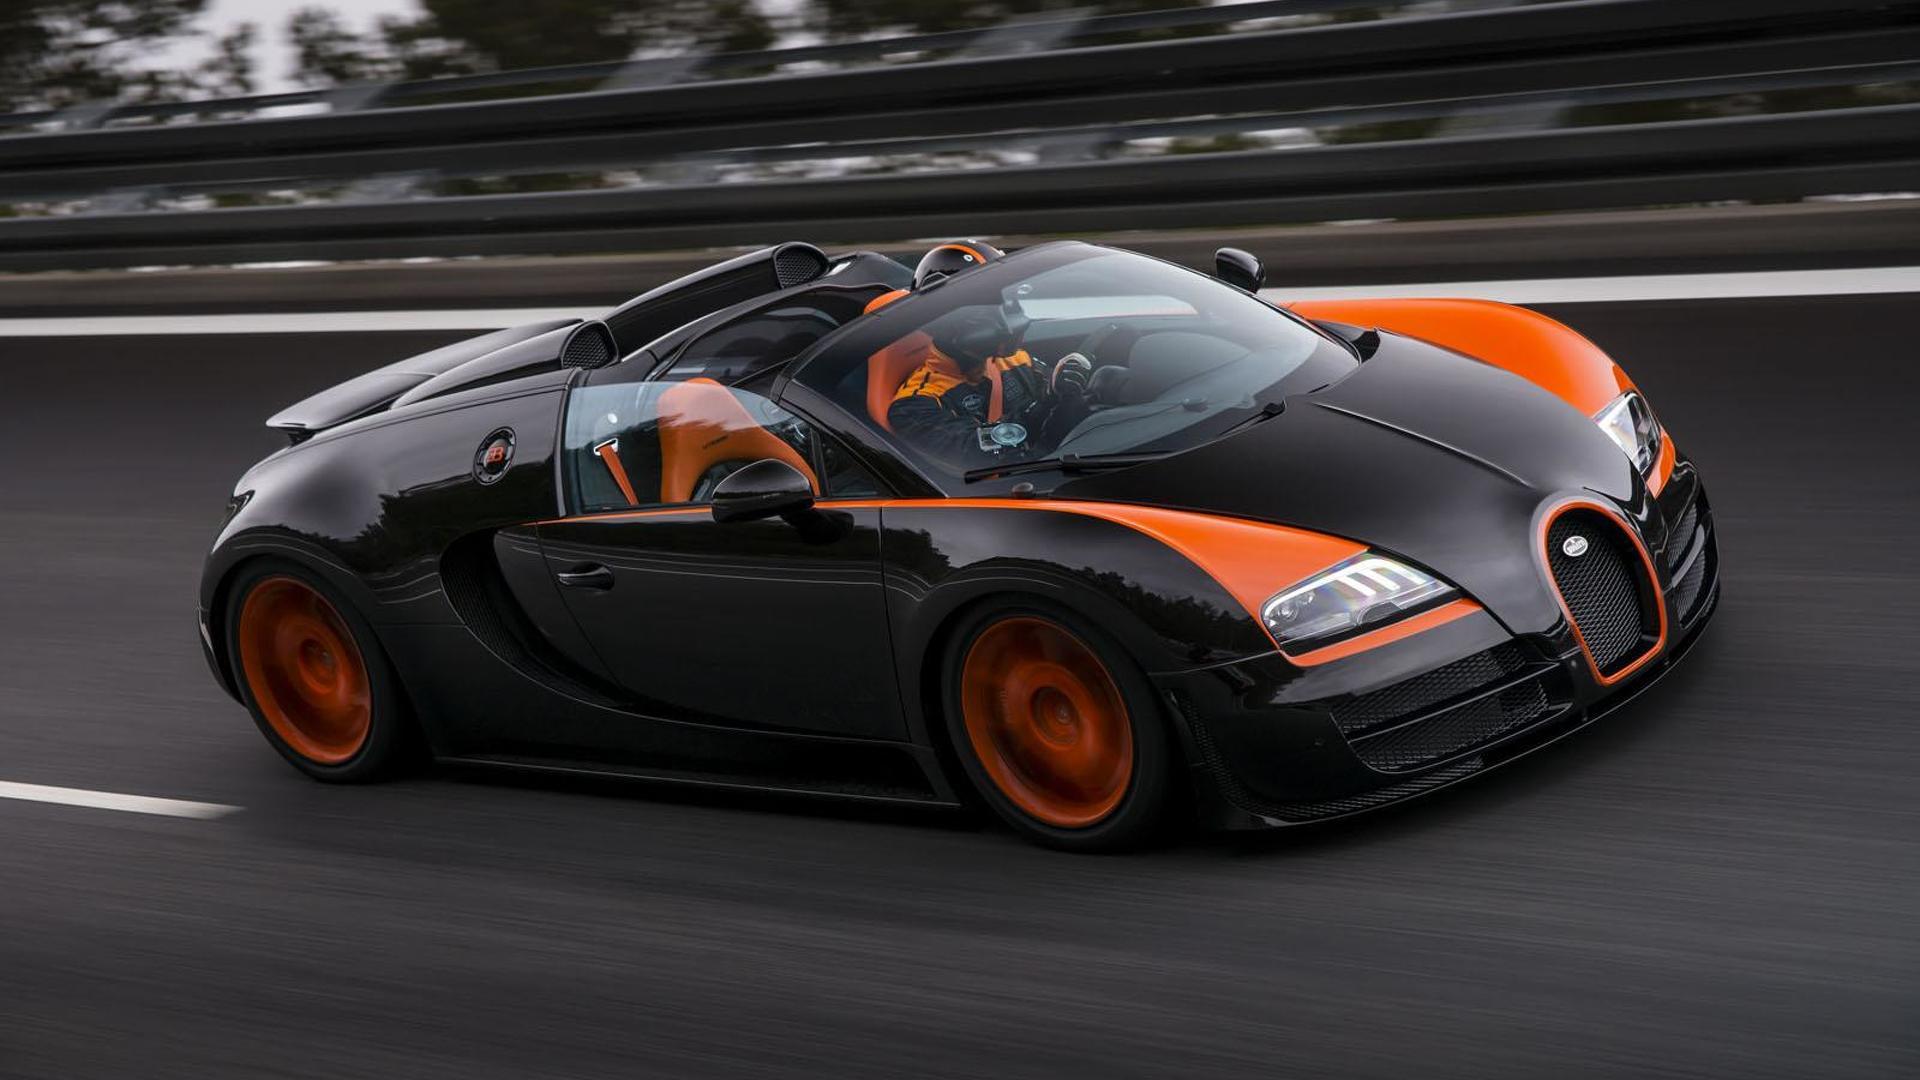 2013-377528-bugatti-veyron-grand-sport-vitesse-world-record-car-edition-11-4-20131 Fascinating Bugatti Veyron Grand Sport Vitesse Convertible Cars Trend